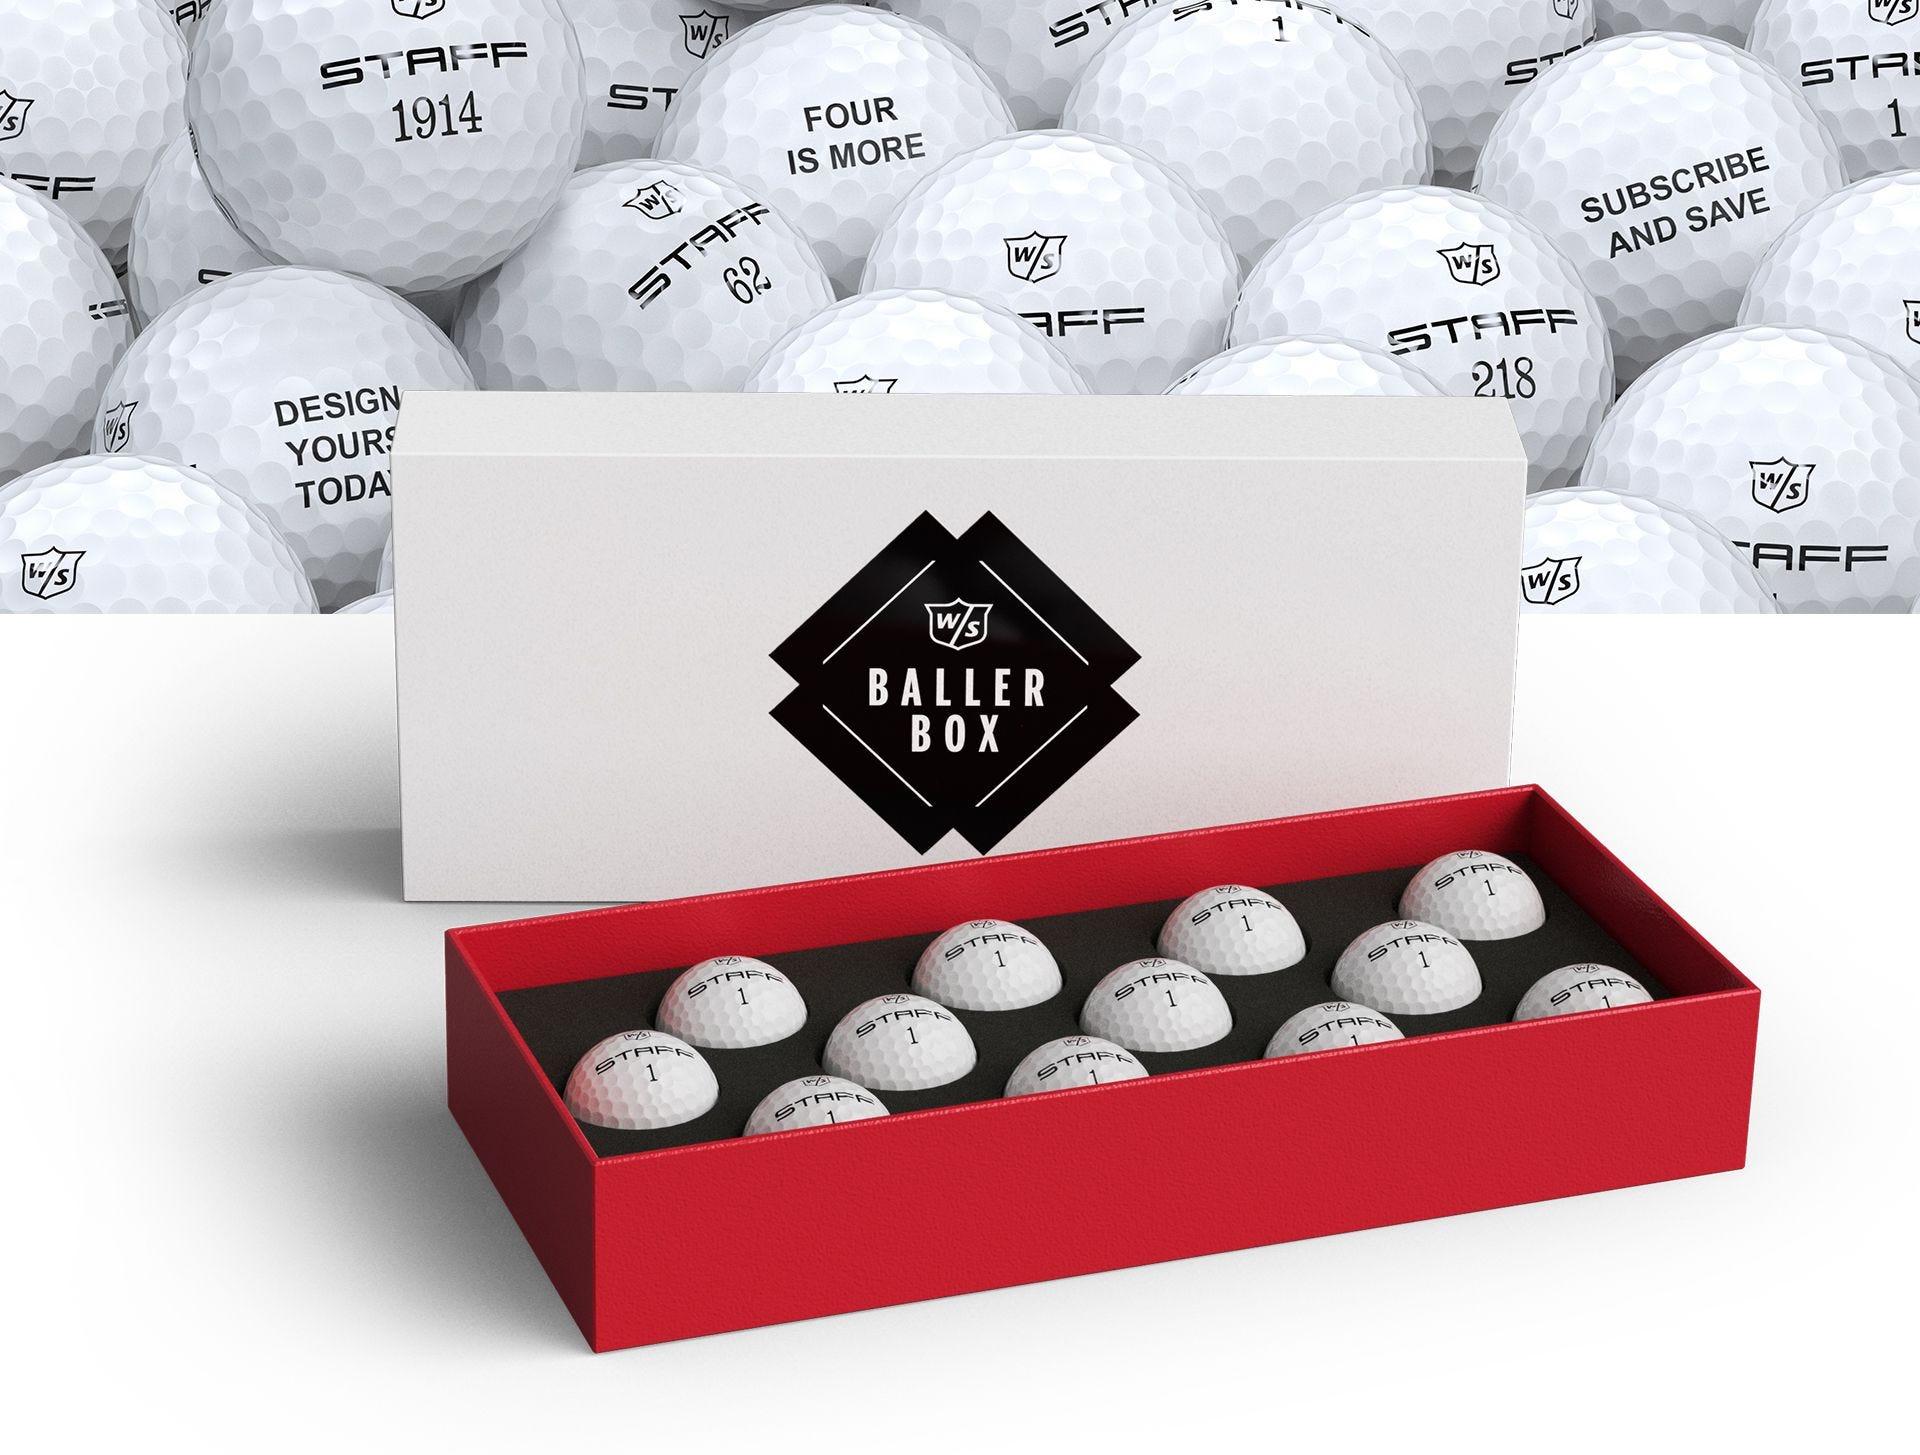 Wilson Staff Model Baller Box